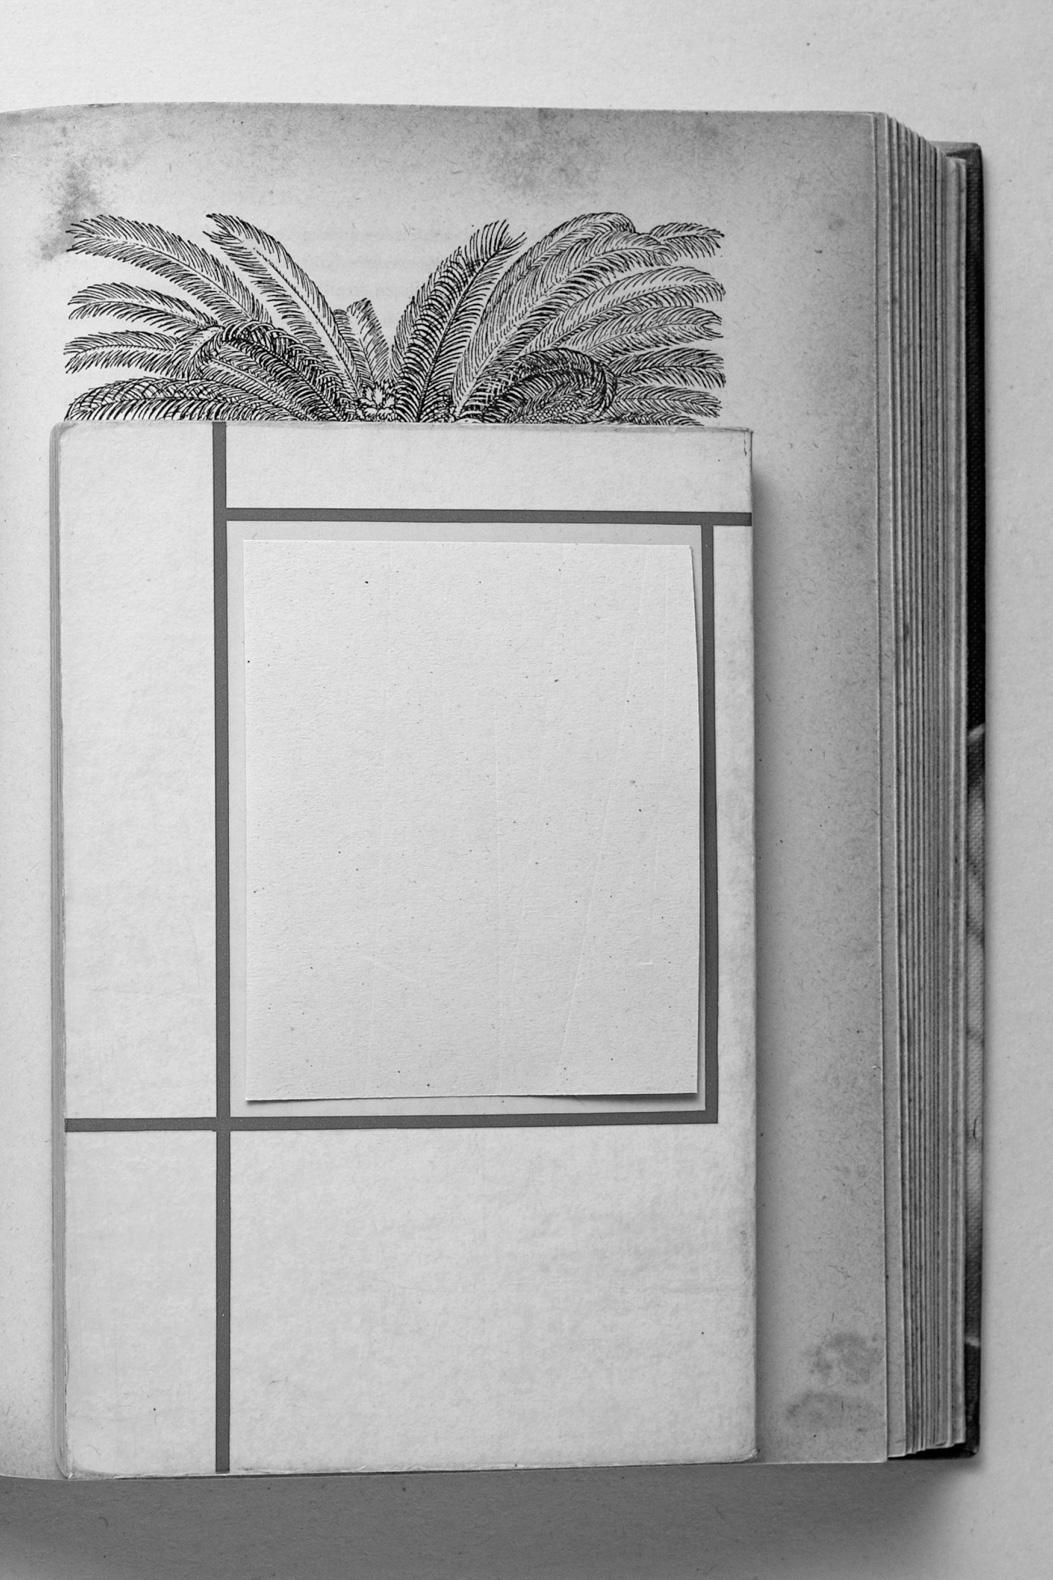 Rometti Costales, Ediciones del Exotismo (extract). Tenderpixel.